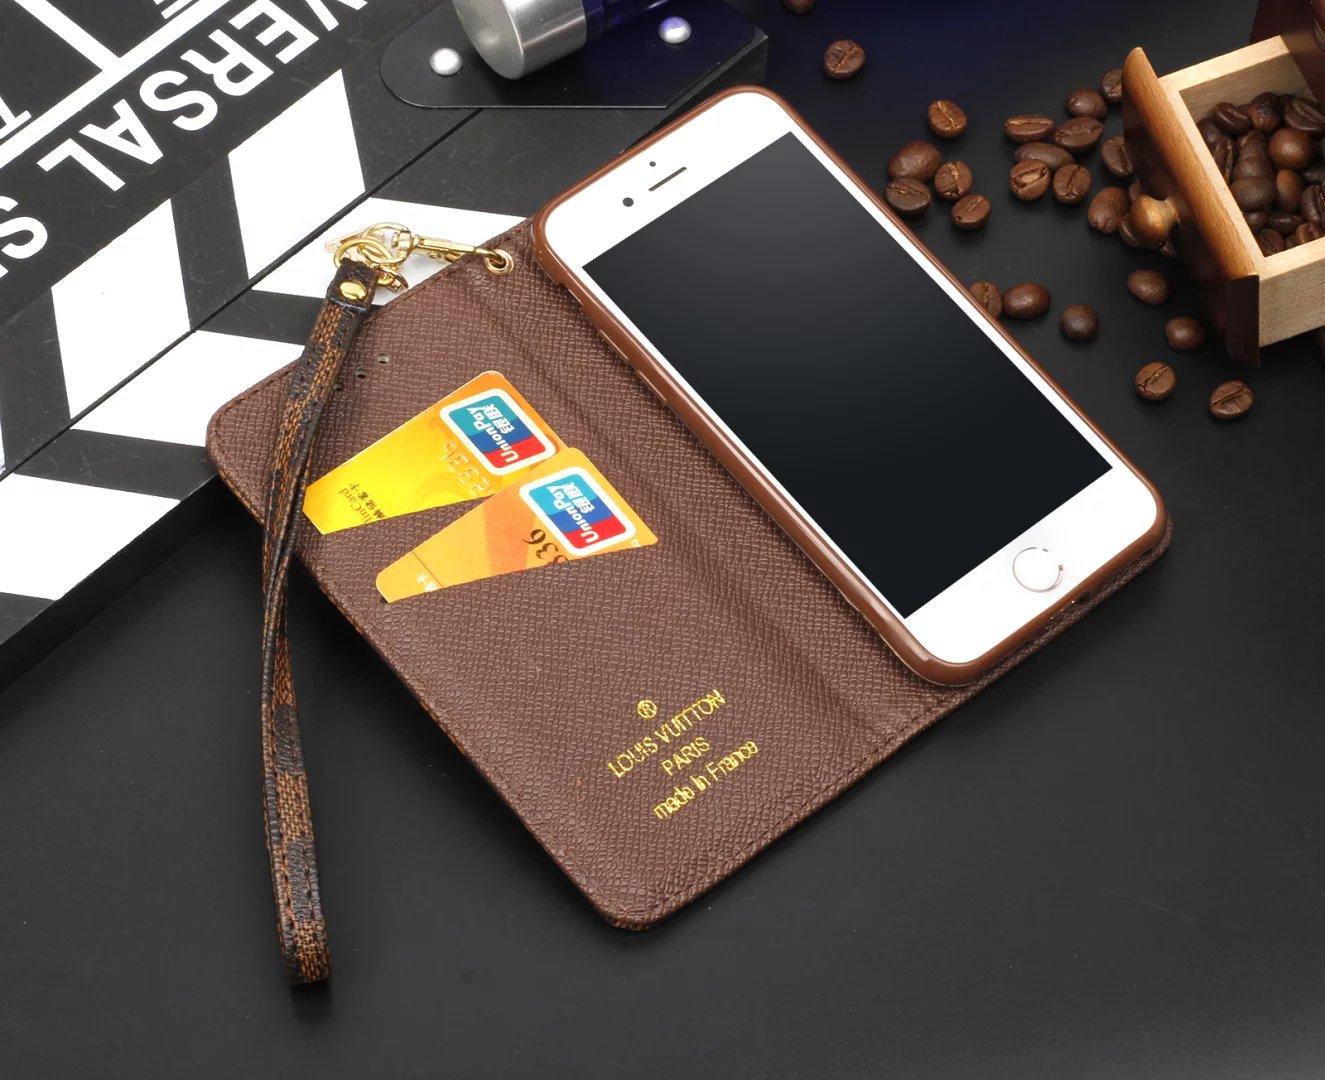 eigene iphone hülle iphone hülle online shop Louis Vuitton iphone 8 hüllen phone ca8 elber gestalten smartphone tasche 8lber machen ipone hülle handyhülle kreieren iphone 8 neu schutzhülle 8lbst gestalten